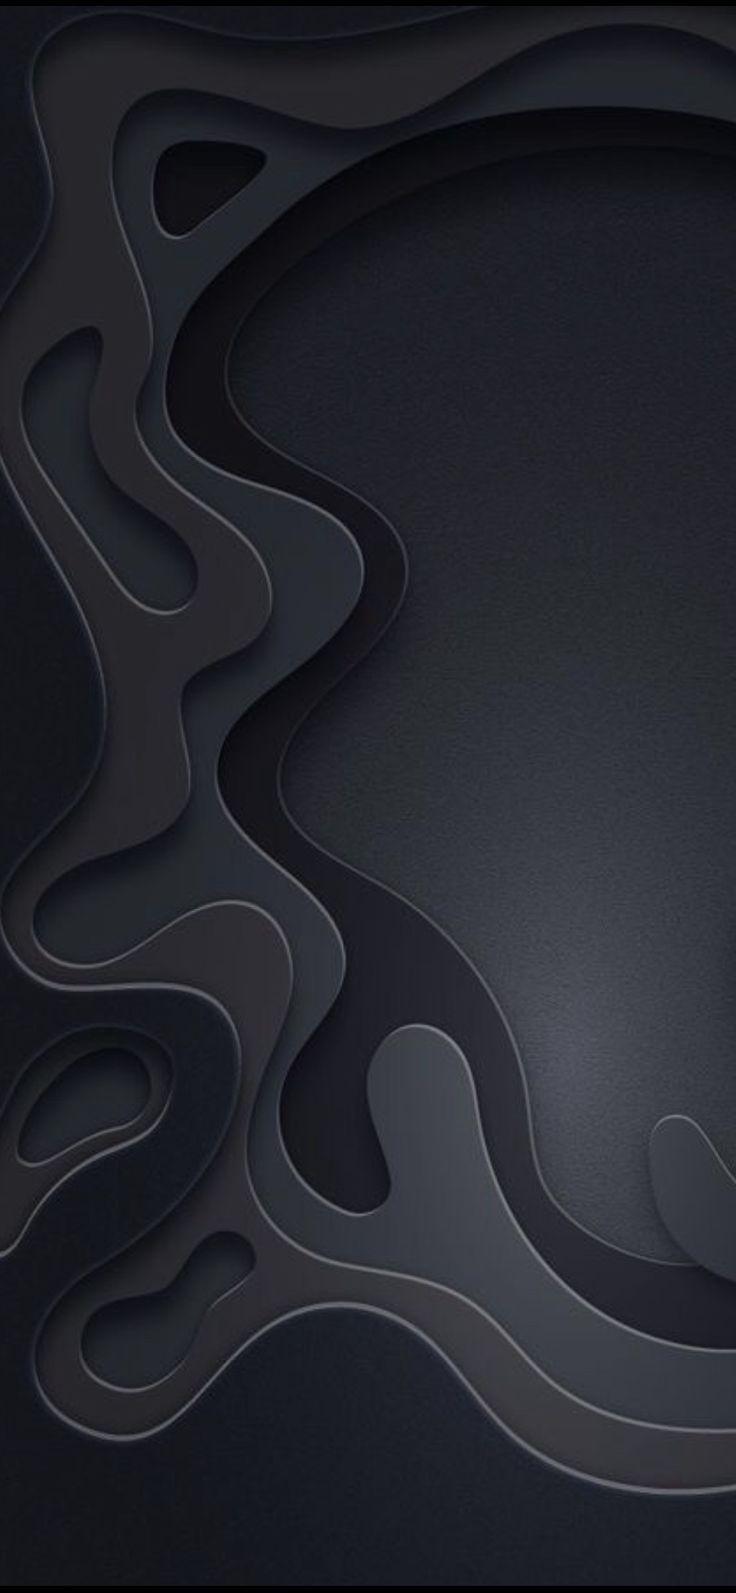 Iphone X Wallpaper Wallpaper Iphone X 364862007307118900 Dark Wallpaper Iphone Dark Wallpaper Black Wallpaper Iphone